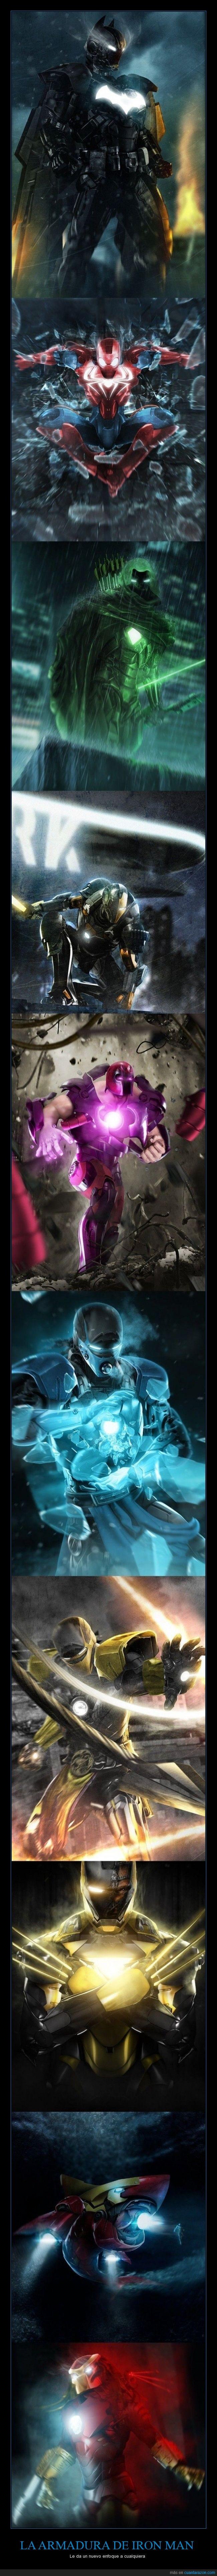 armadura,batman,creativo,futurista,iron man,lobezno,magneto,predator,scorpion,spiderman,Sub zero,super heroe,tiburon